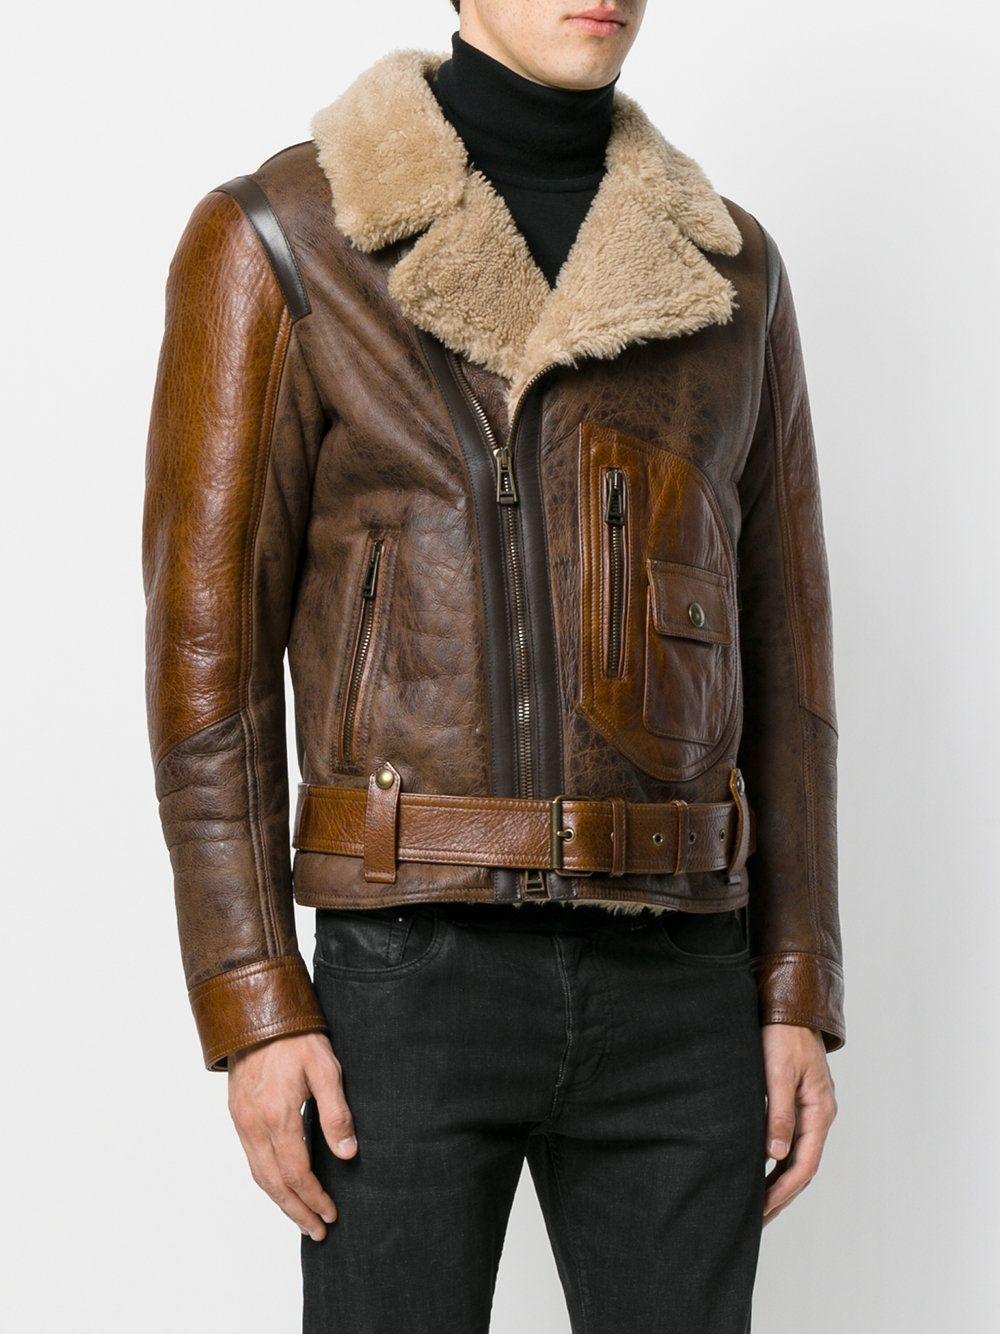 995b62eecfb1 Belstaff shearling biker jacket